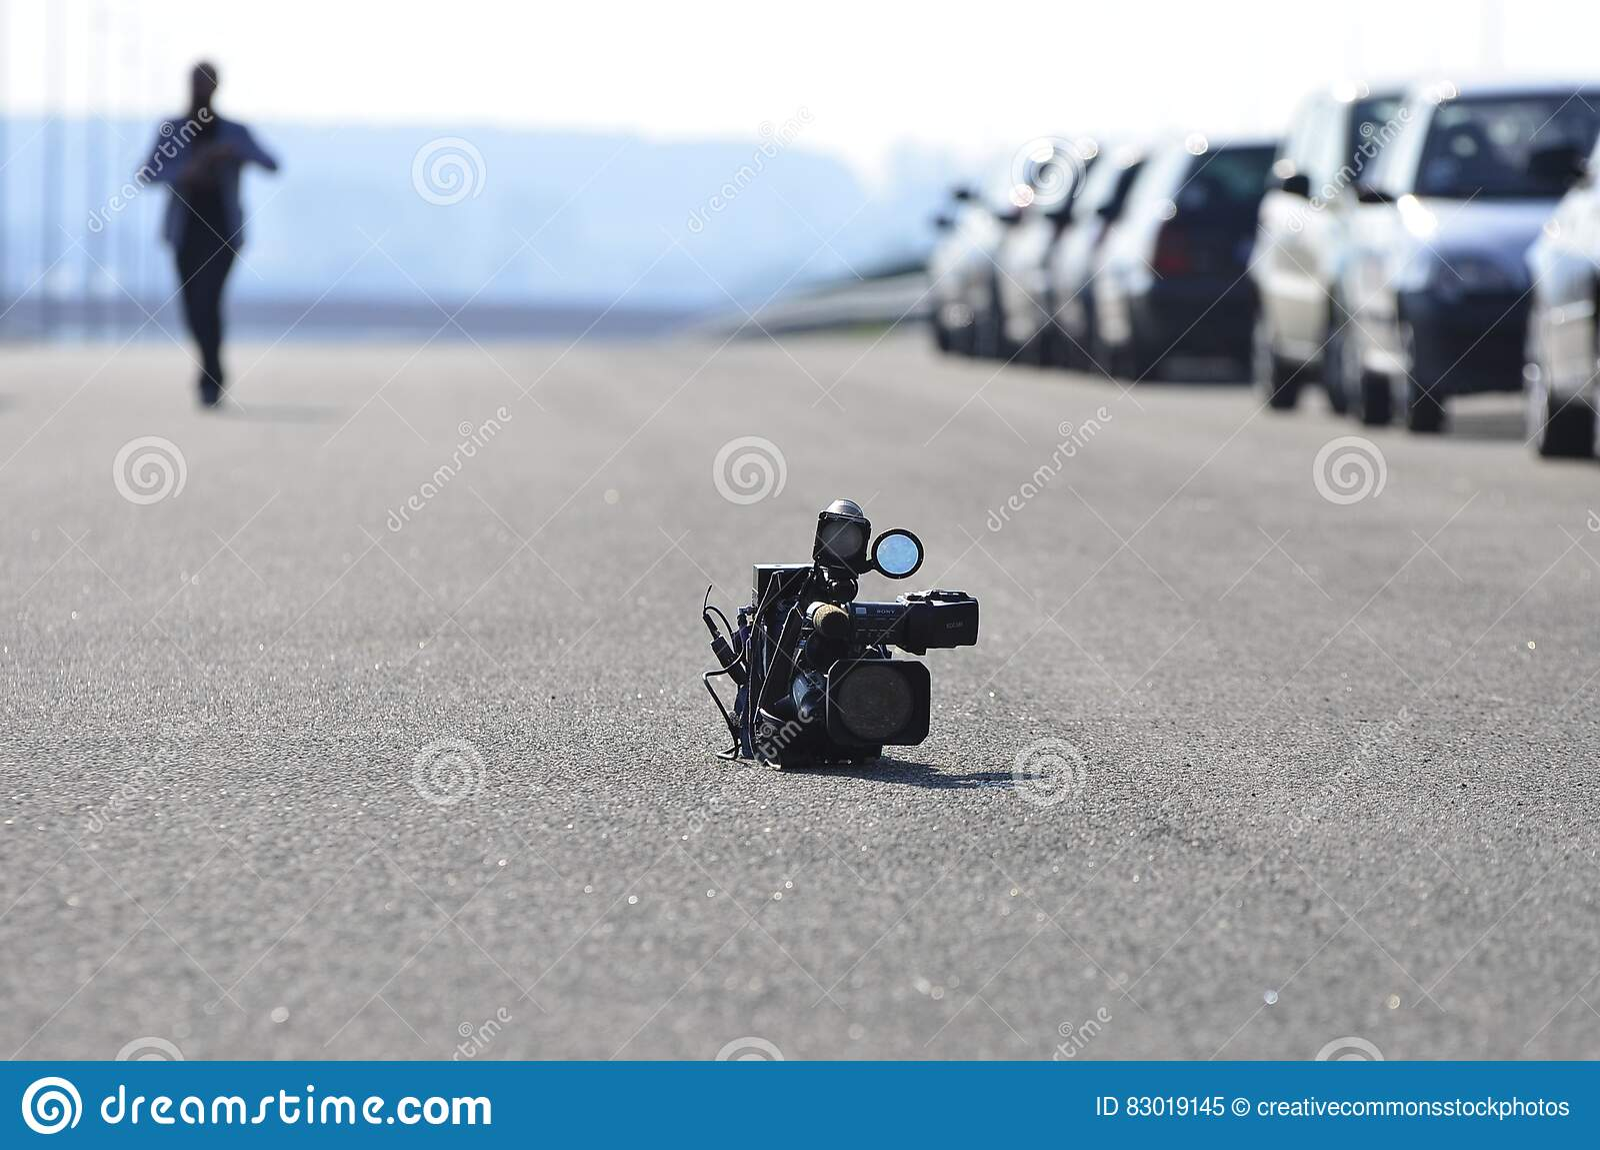 Download Video Camera On Asphalt Road Stock Image - Image of video, road: 83019145